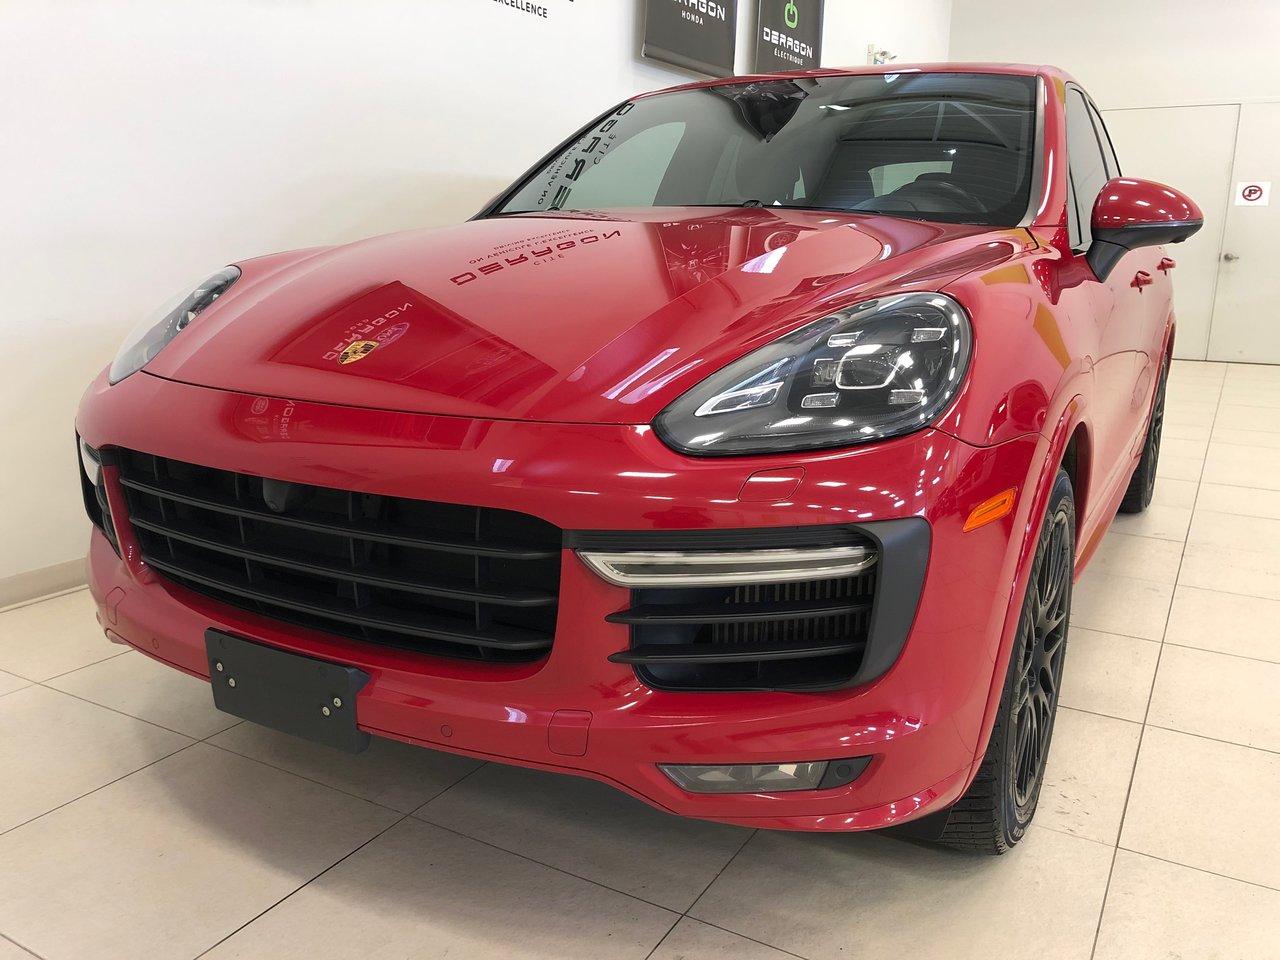 Porsche Cayenne 2017 GTS, SPORT CHRONO PACKAGE